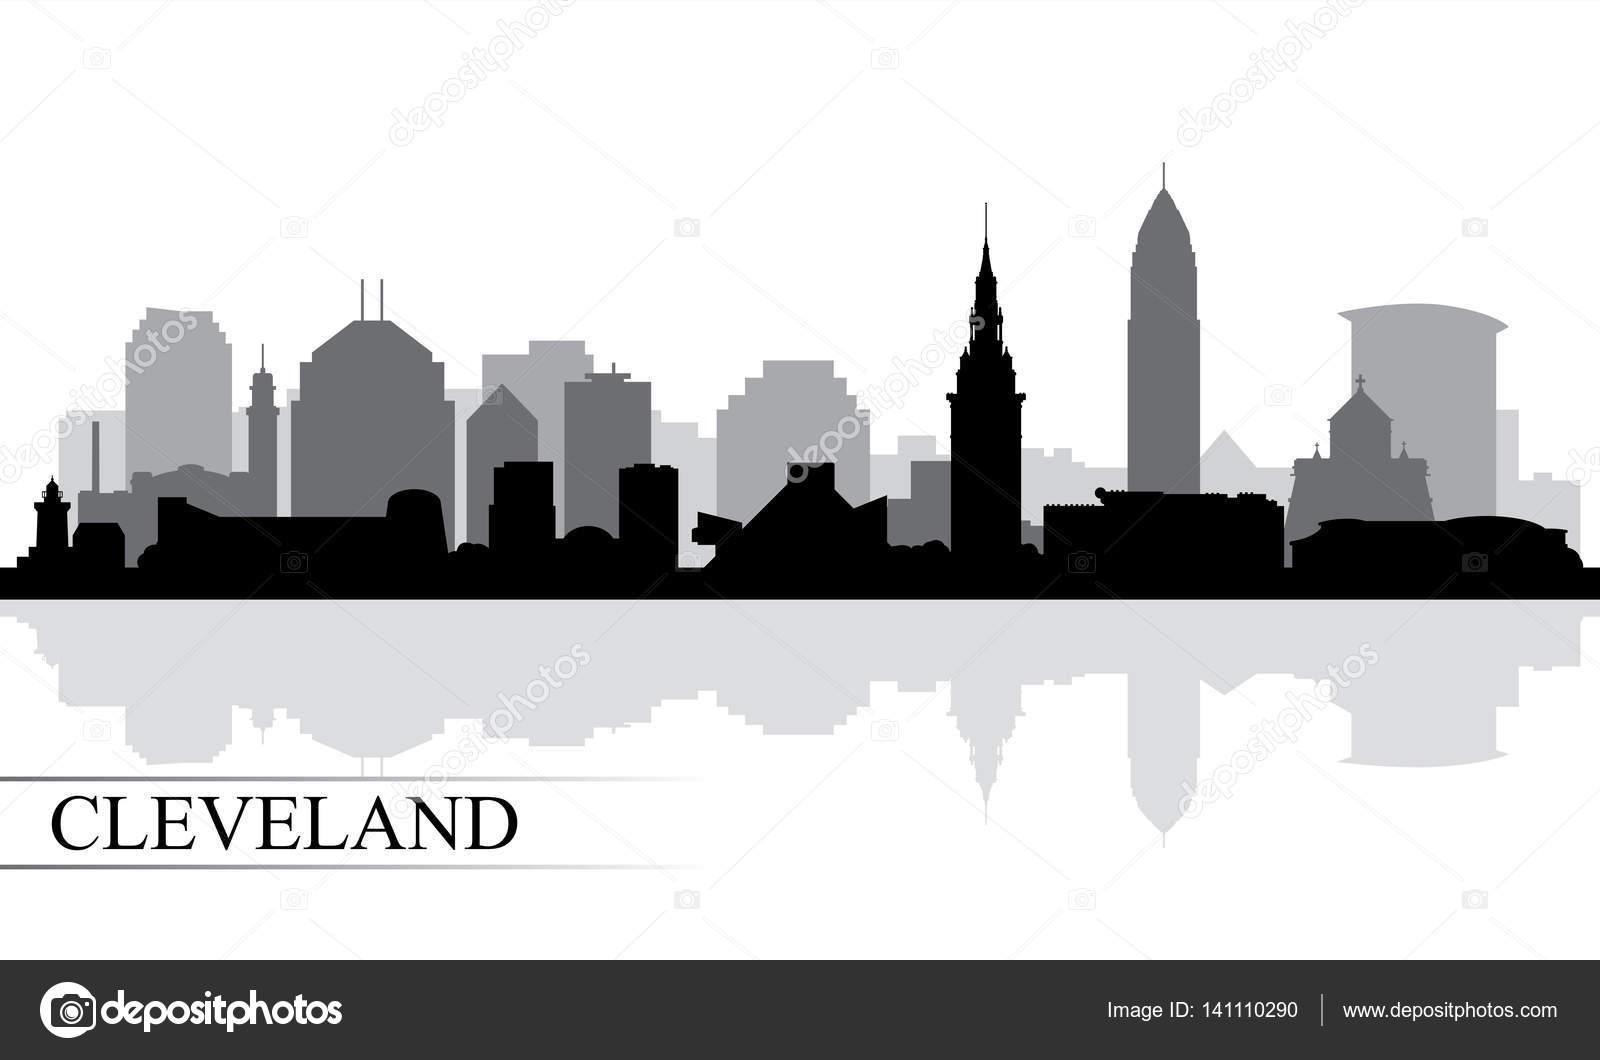 cleveland skyline wallpaper